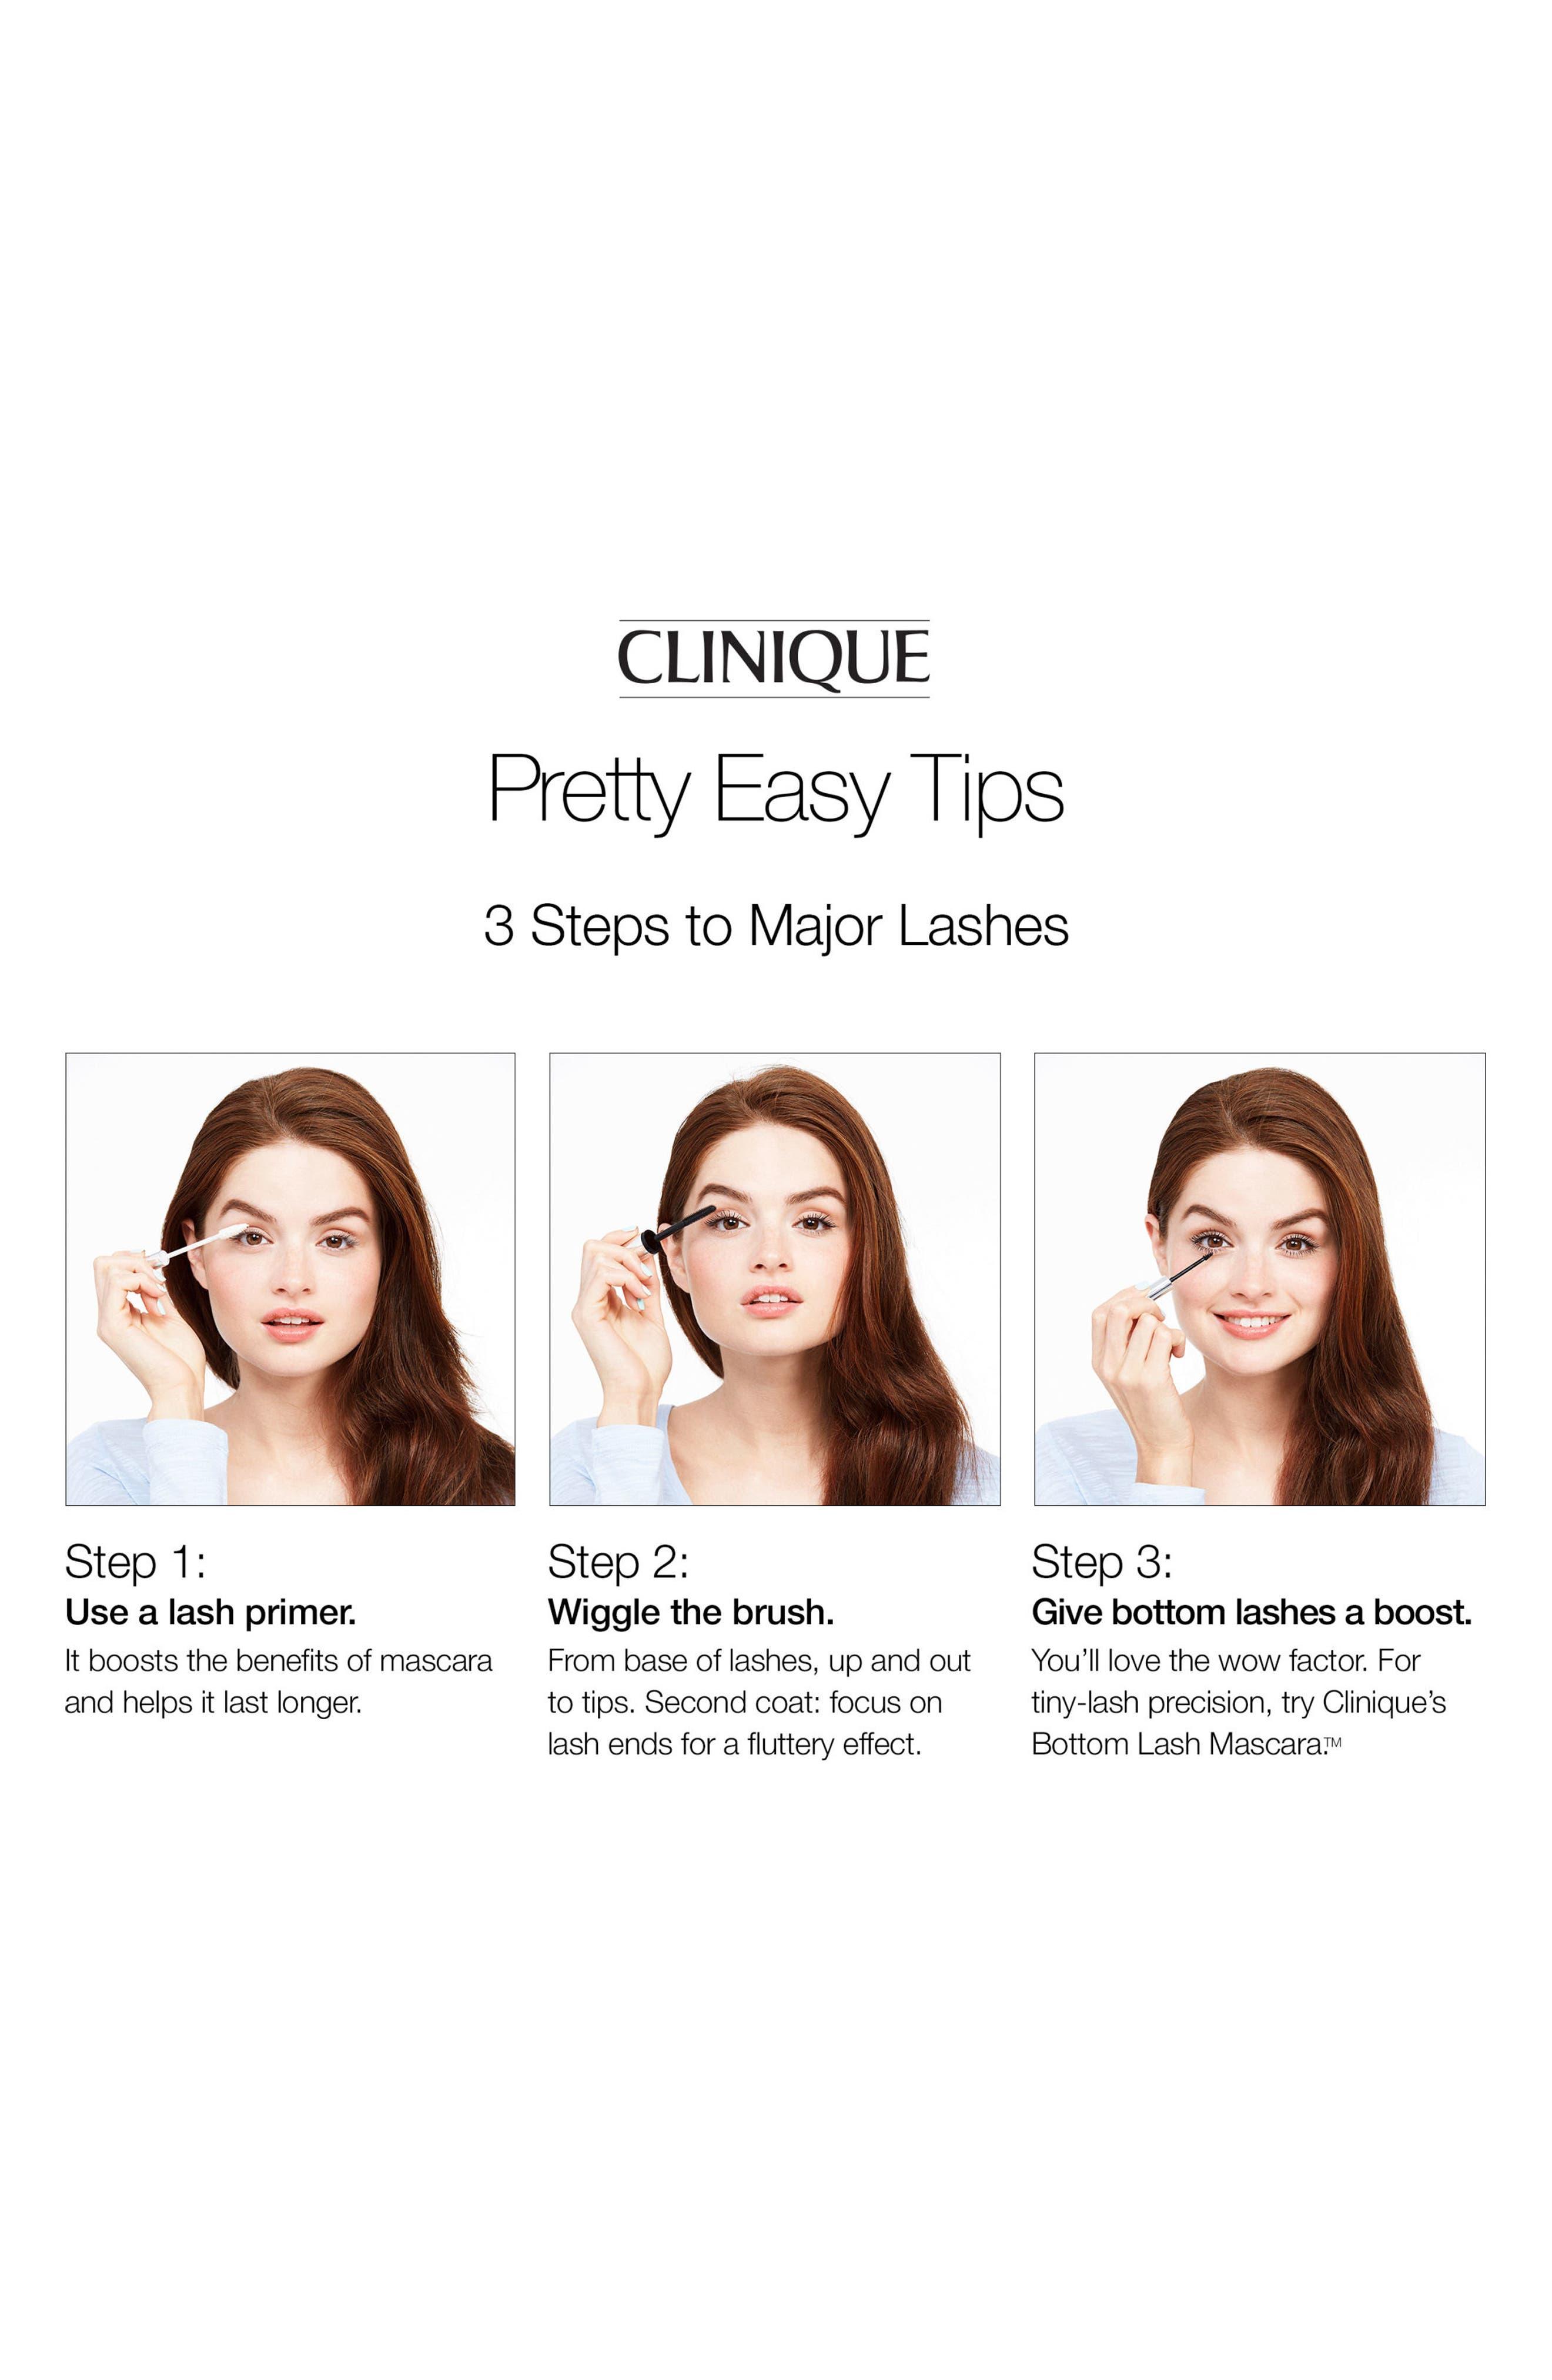 CLINIQUE, Lash Power Mascara Long-Wearing Formula, Alternate thumbnail 3, color, 001